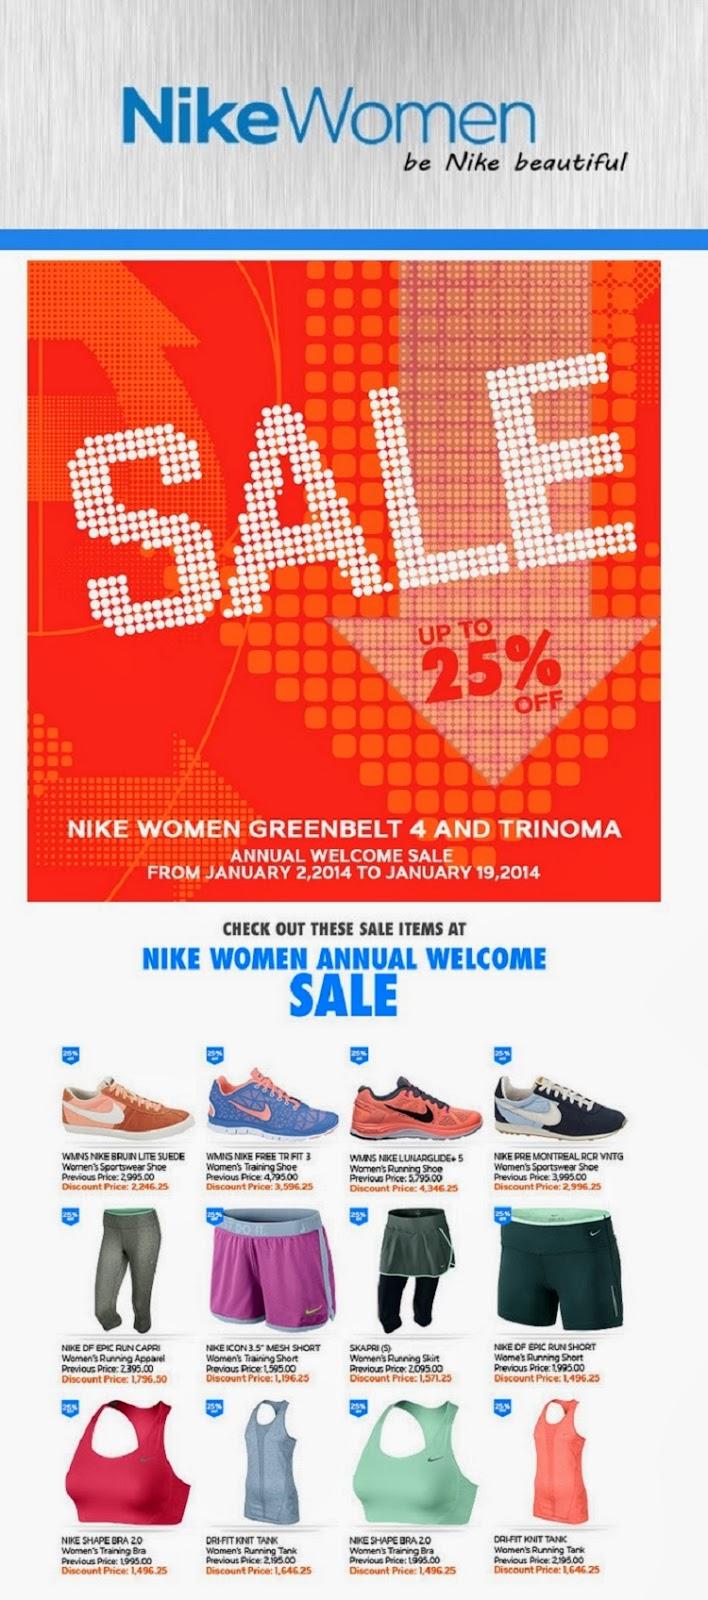 Sale Alert: Nike Women up to 25% Off (Greenbelt 4 & TriNoma)